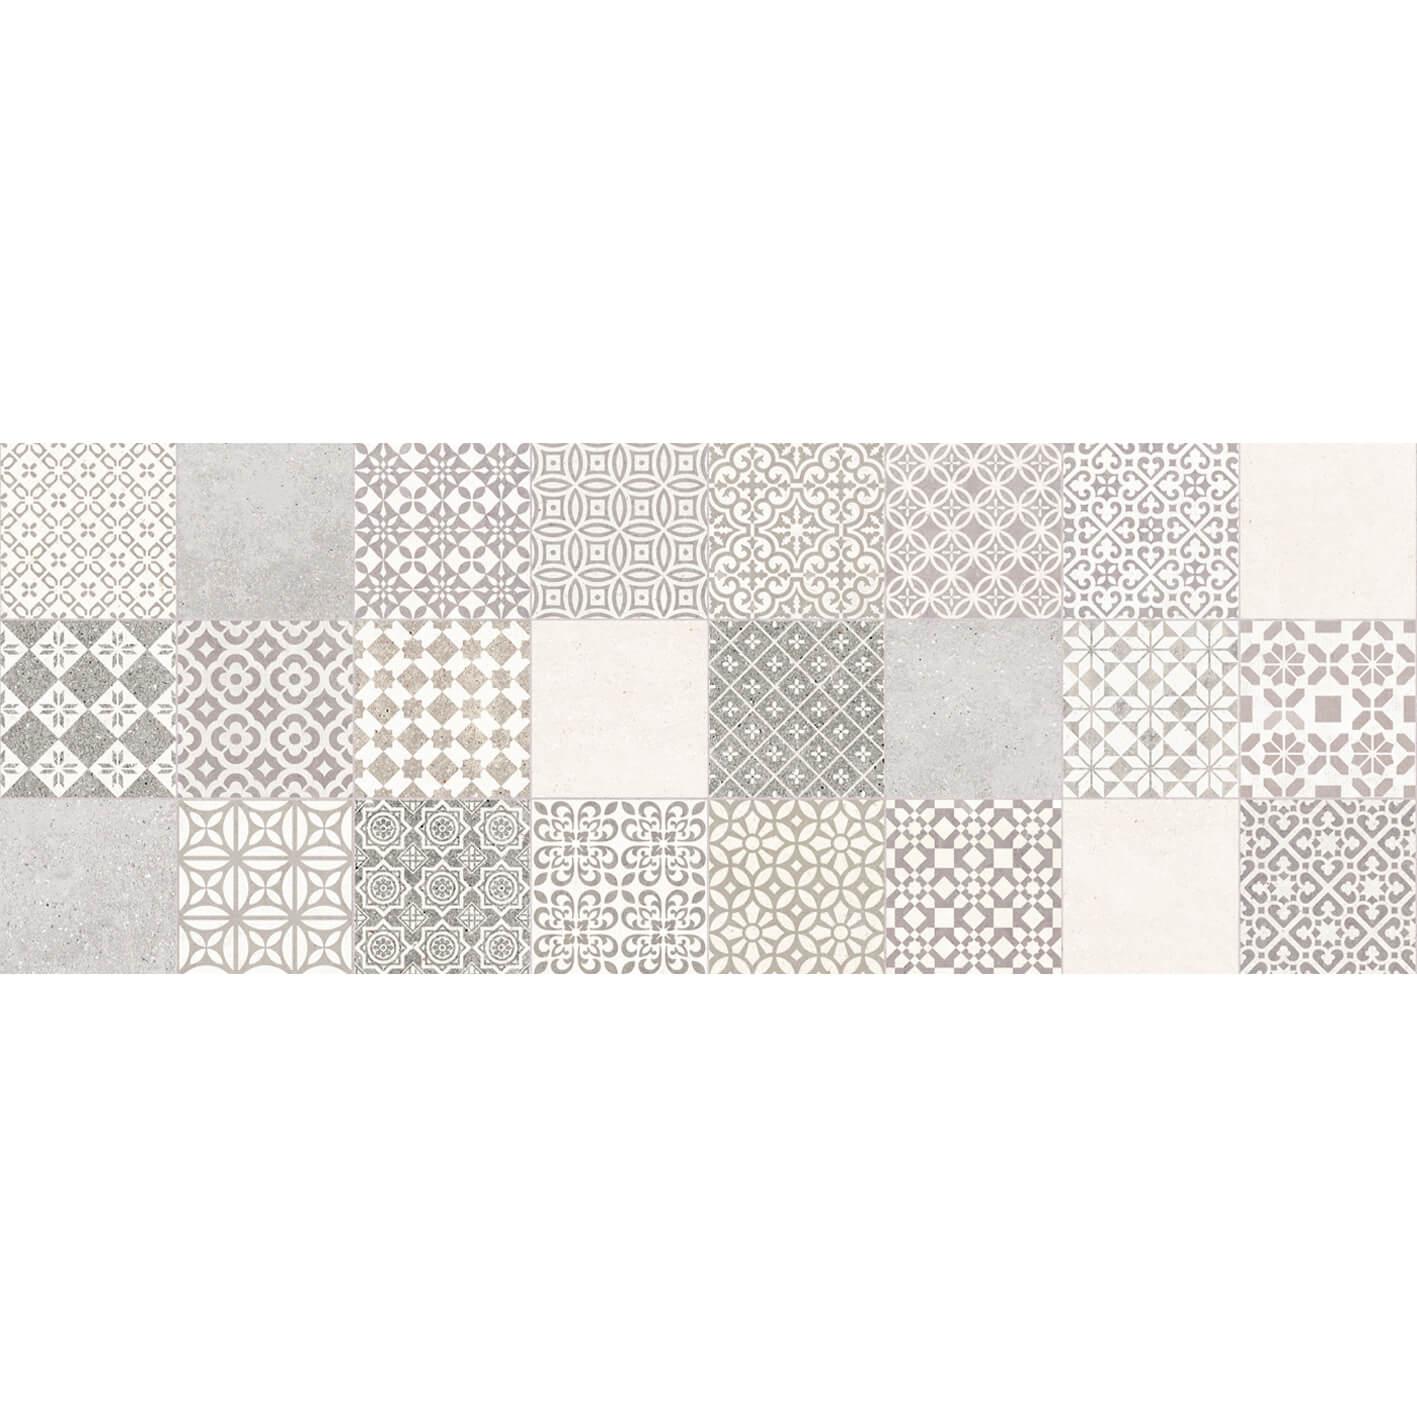 Porcelanosa Marbella Stone 45 X 120cm Ceramic Wall Tiles